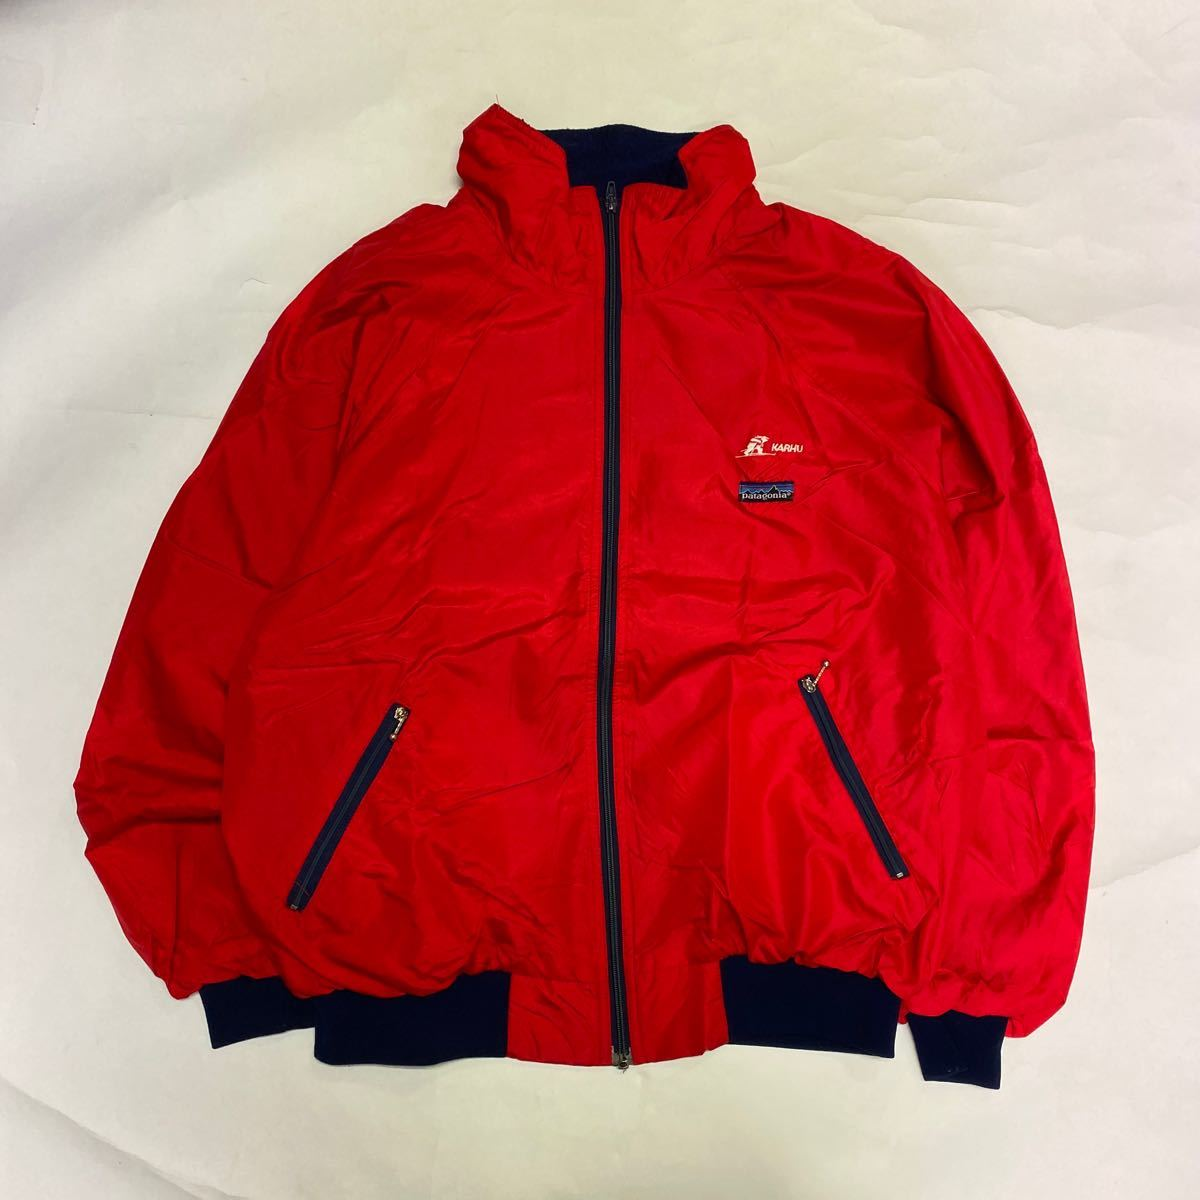 80s patagonia パタゴニア シェルチンジャケット 赤 ネイビー ut3080_画像1